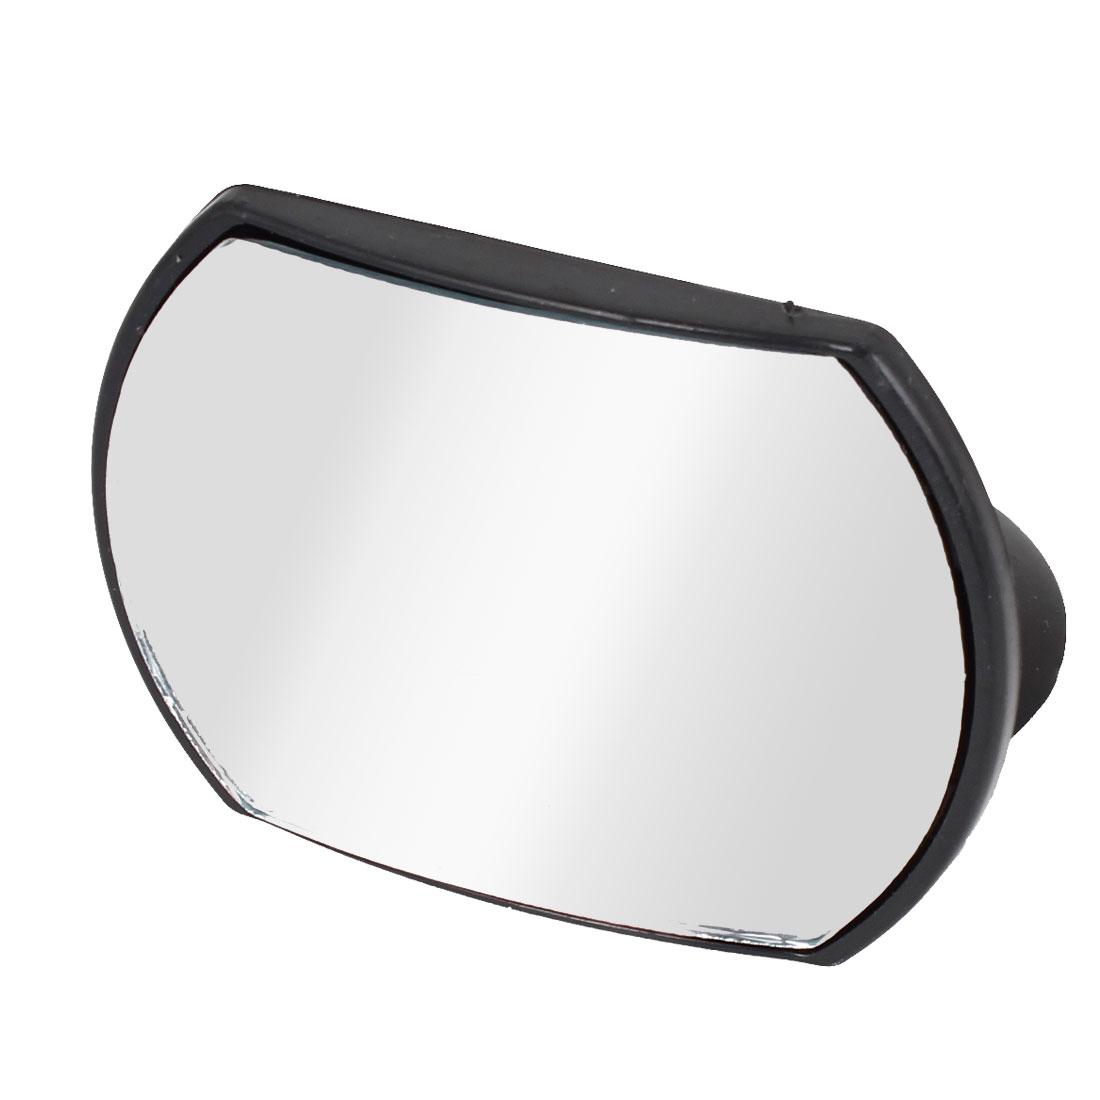 Black Plastic Frame Blind Spot Mirror 9cm x 6cm for Auto Car